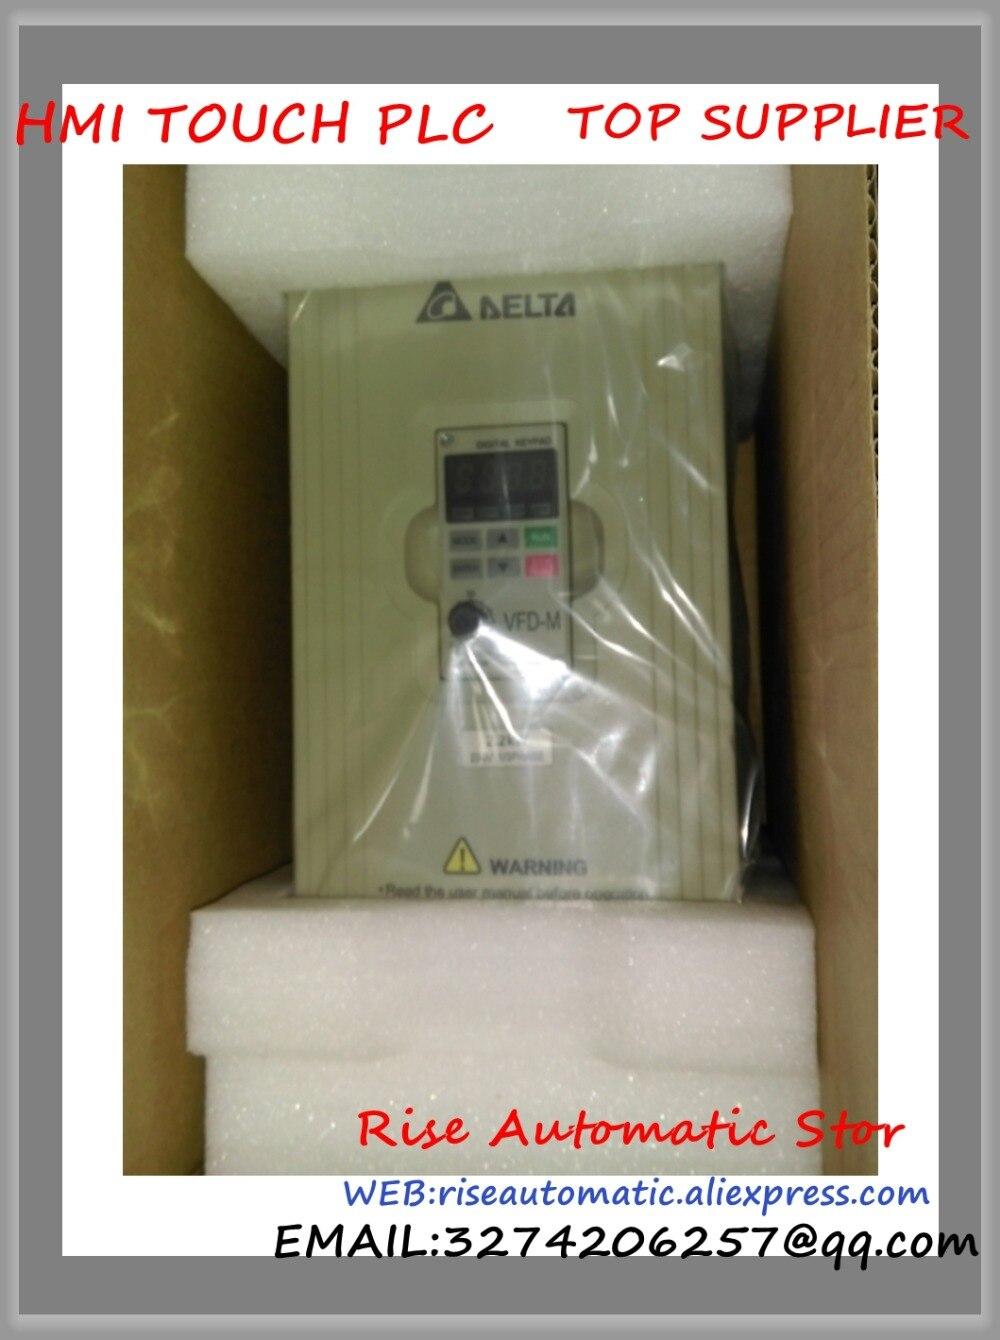 VFD M Inverter AC motor drive 1 phase 220V 2 2Kw 3HP 10A 400HZ new VFD022M21A